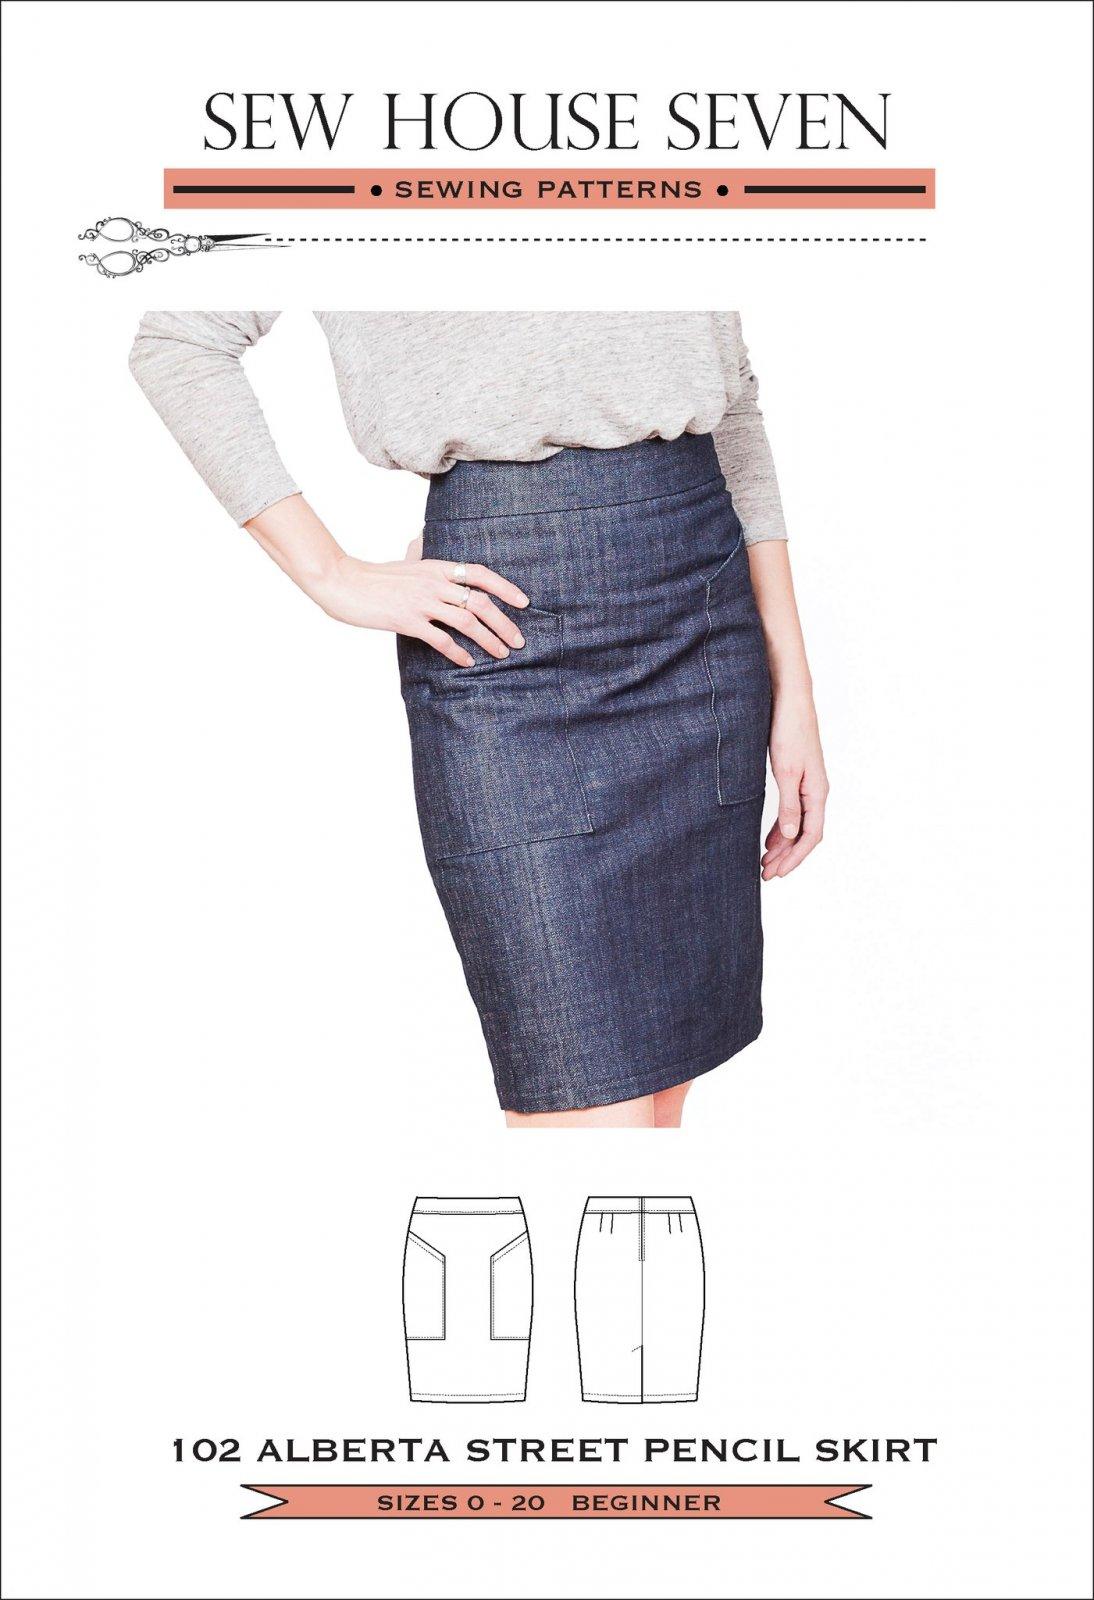 Alberta Street Pencil Skirt - Sew House Seven